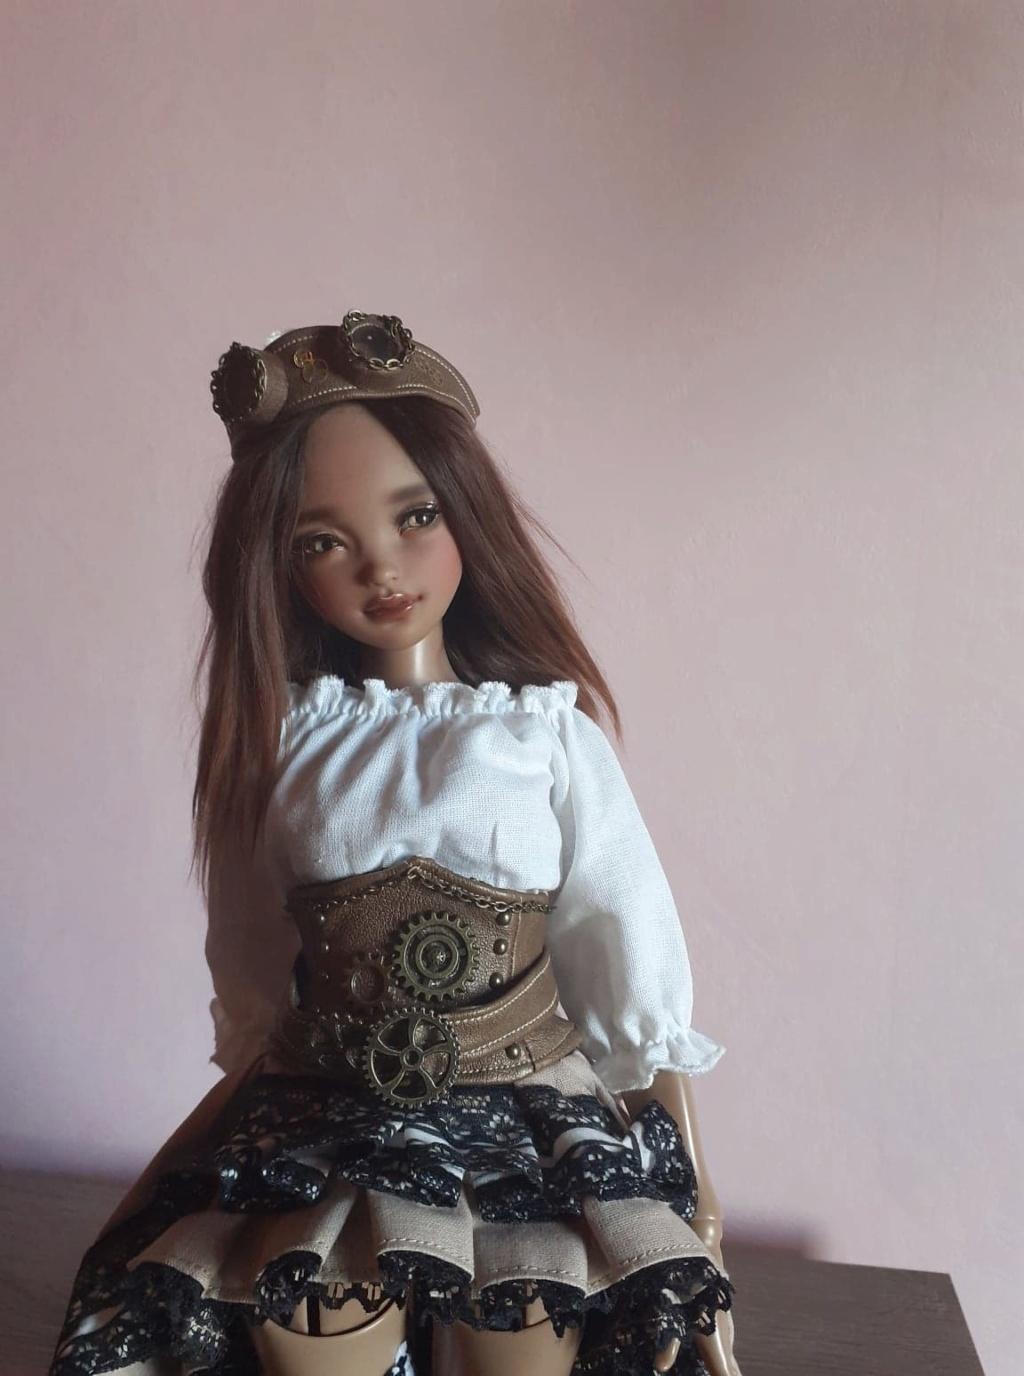 Ziya tan youpla dolls + extra édition d'artiste pour le DRV  Zo710